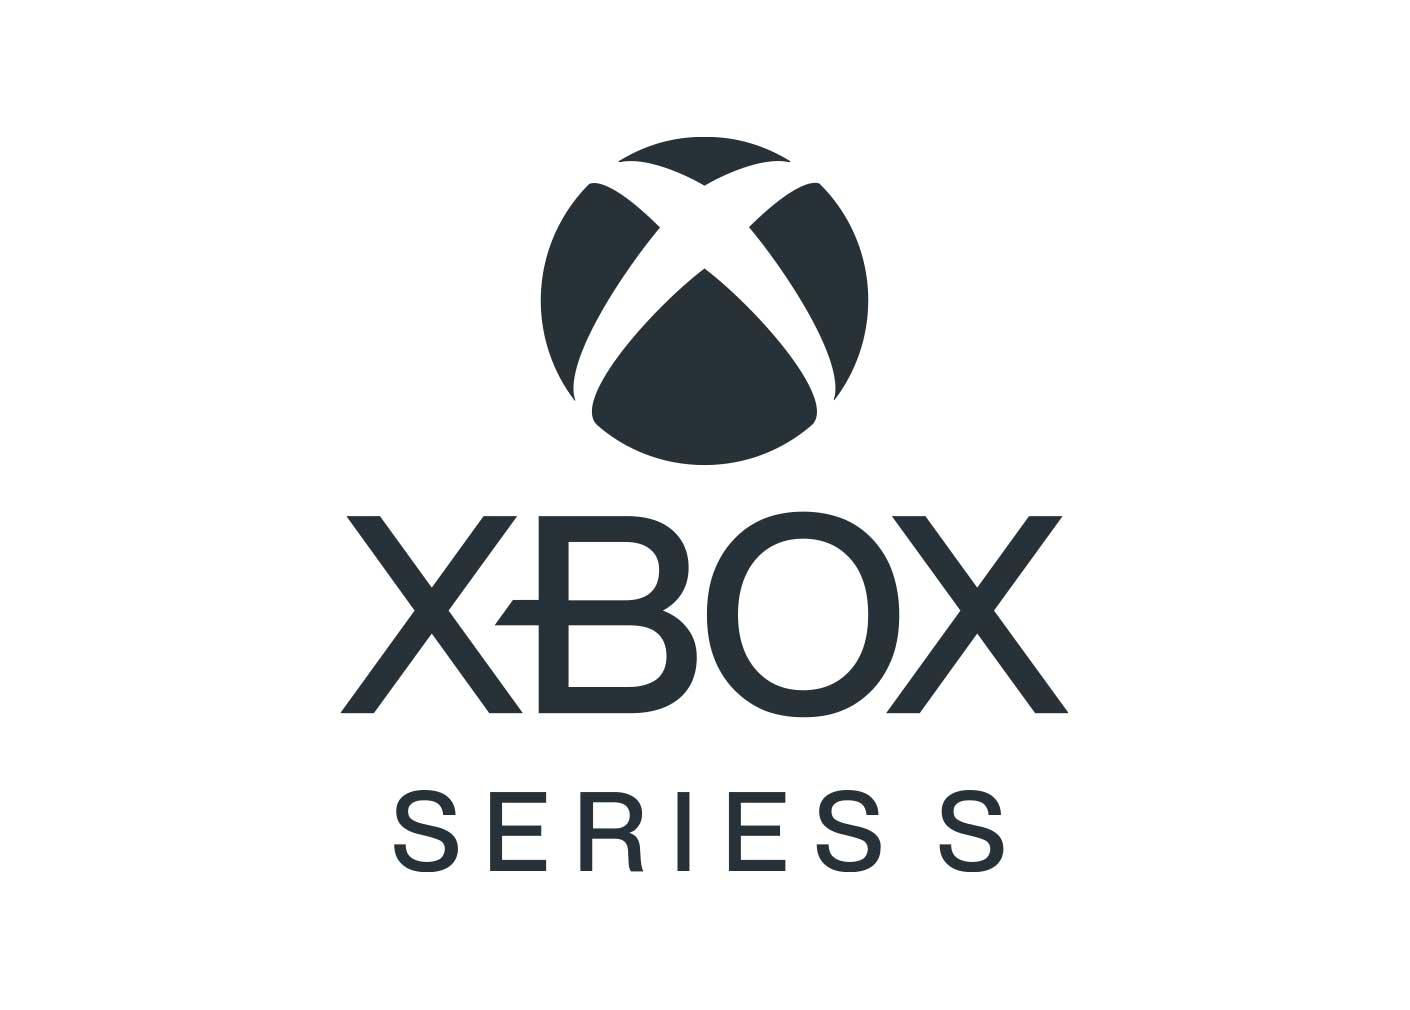 games_xboxs